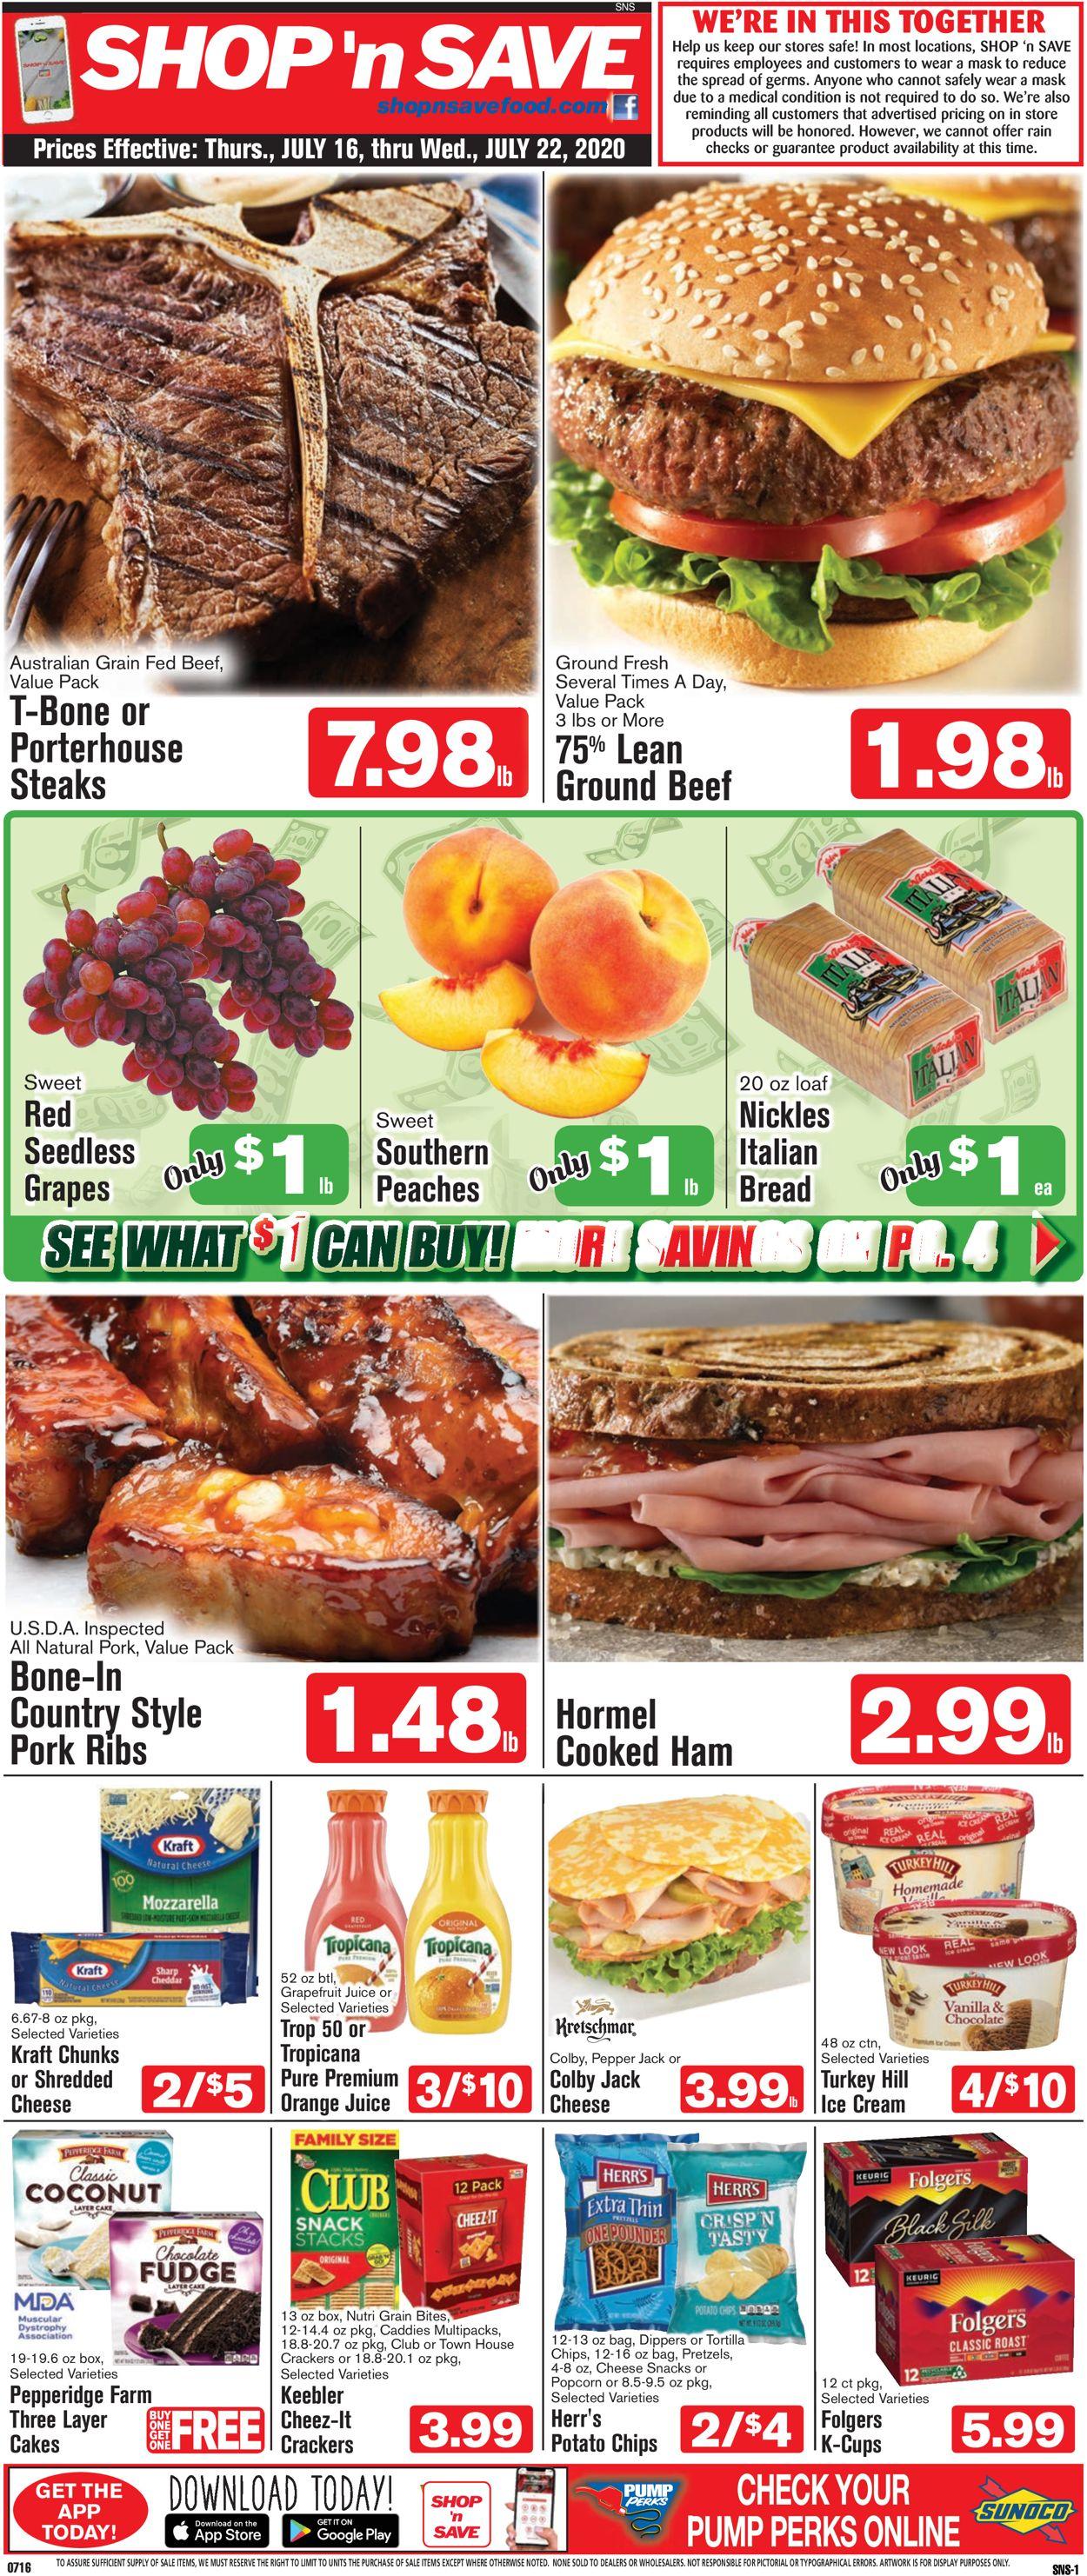 Shop 'n Save (Pittsburgh) Weekly Ad Circular - valid 07/16-07/22/2020